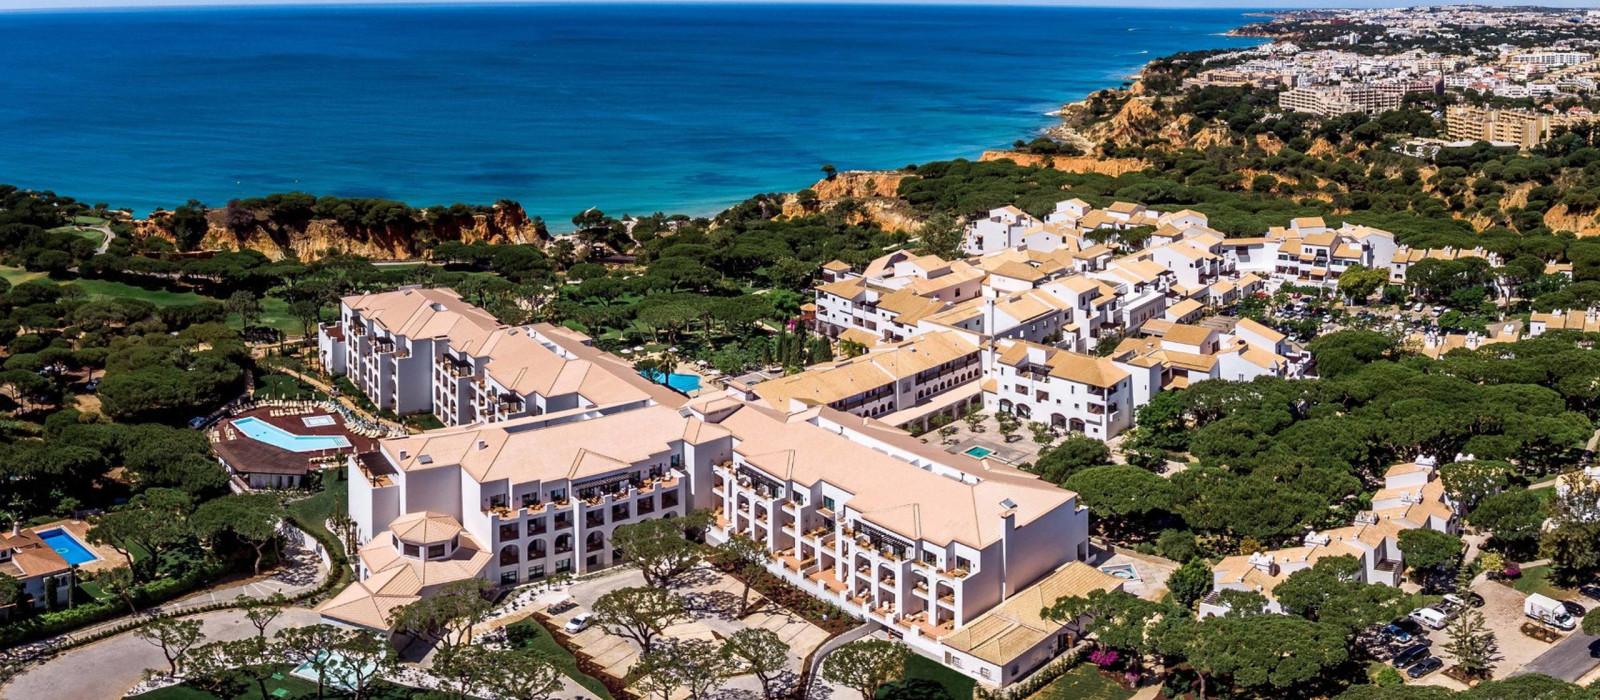 Hotel Pine Cliffs Resort Portugal